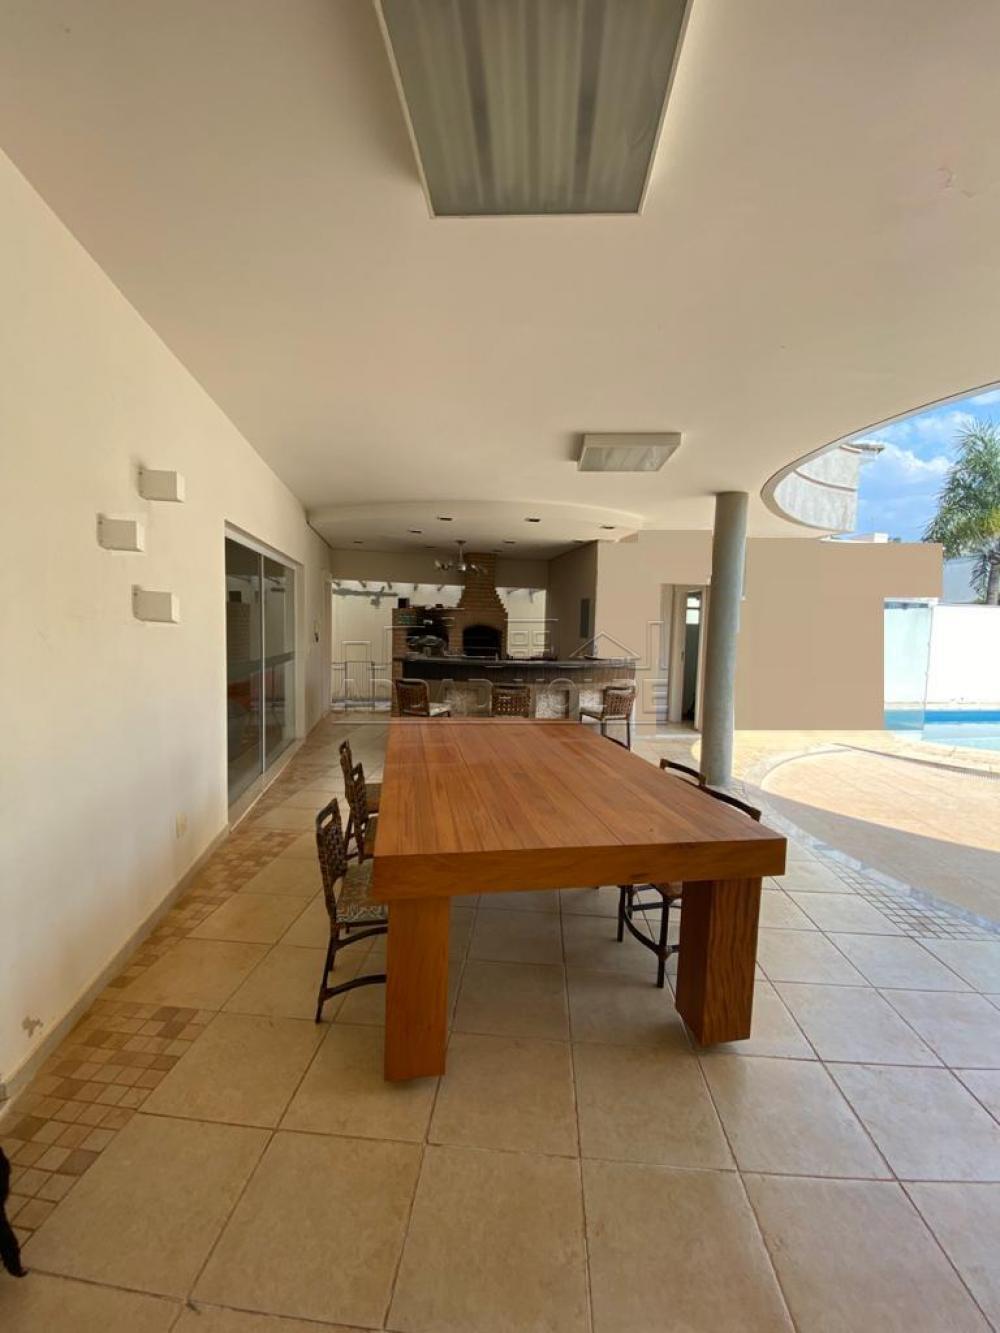 Comprar Casa / Condomínio em Bauru apenas R$ 1.800.000,00 - Foto 20